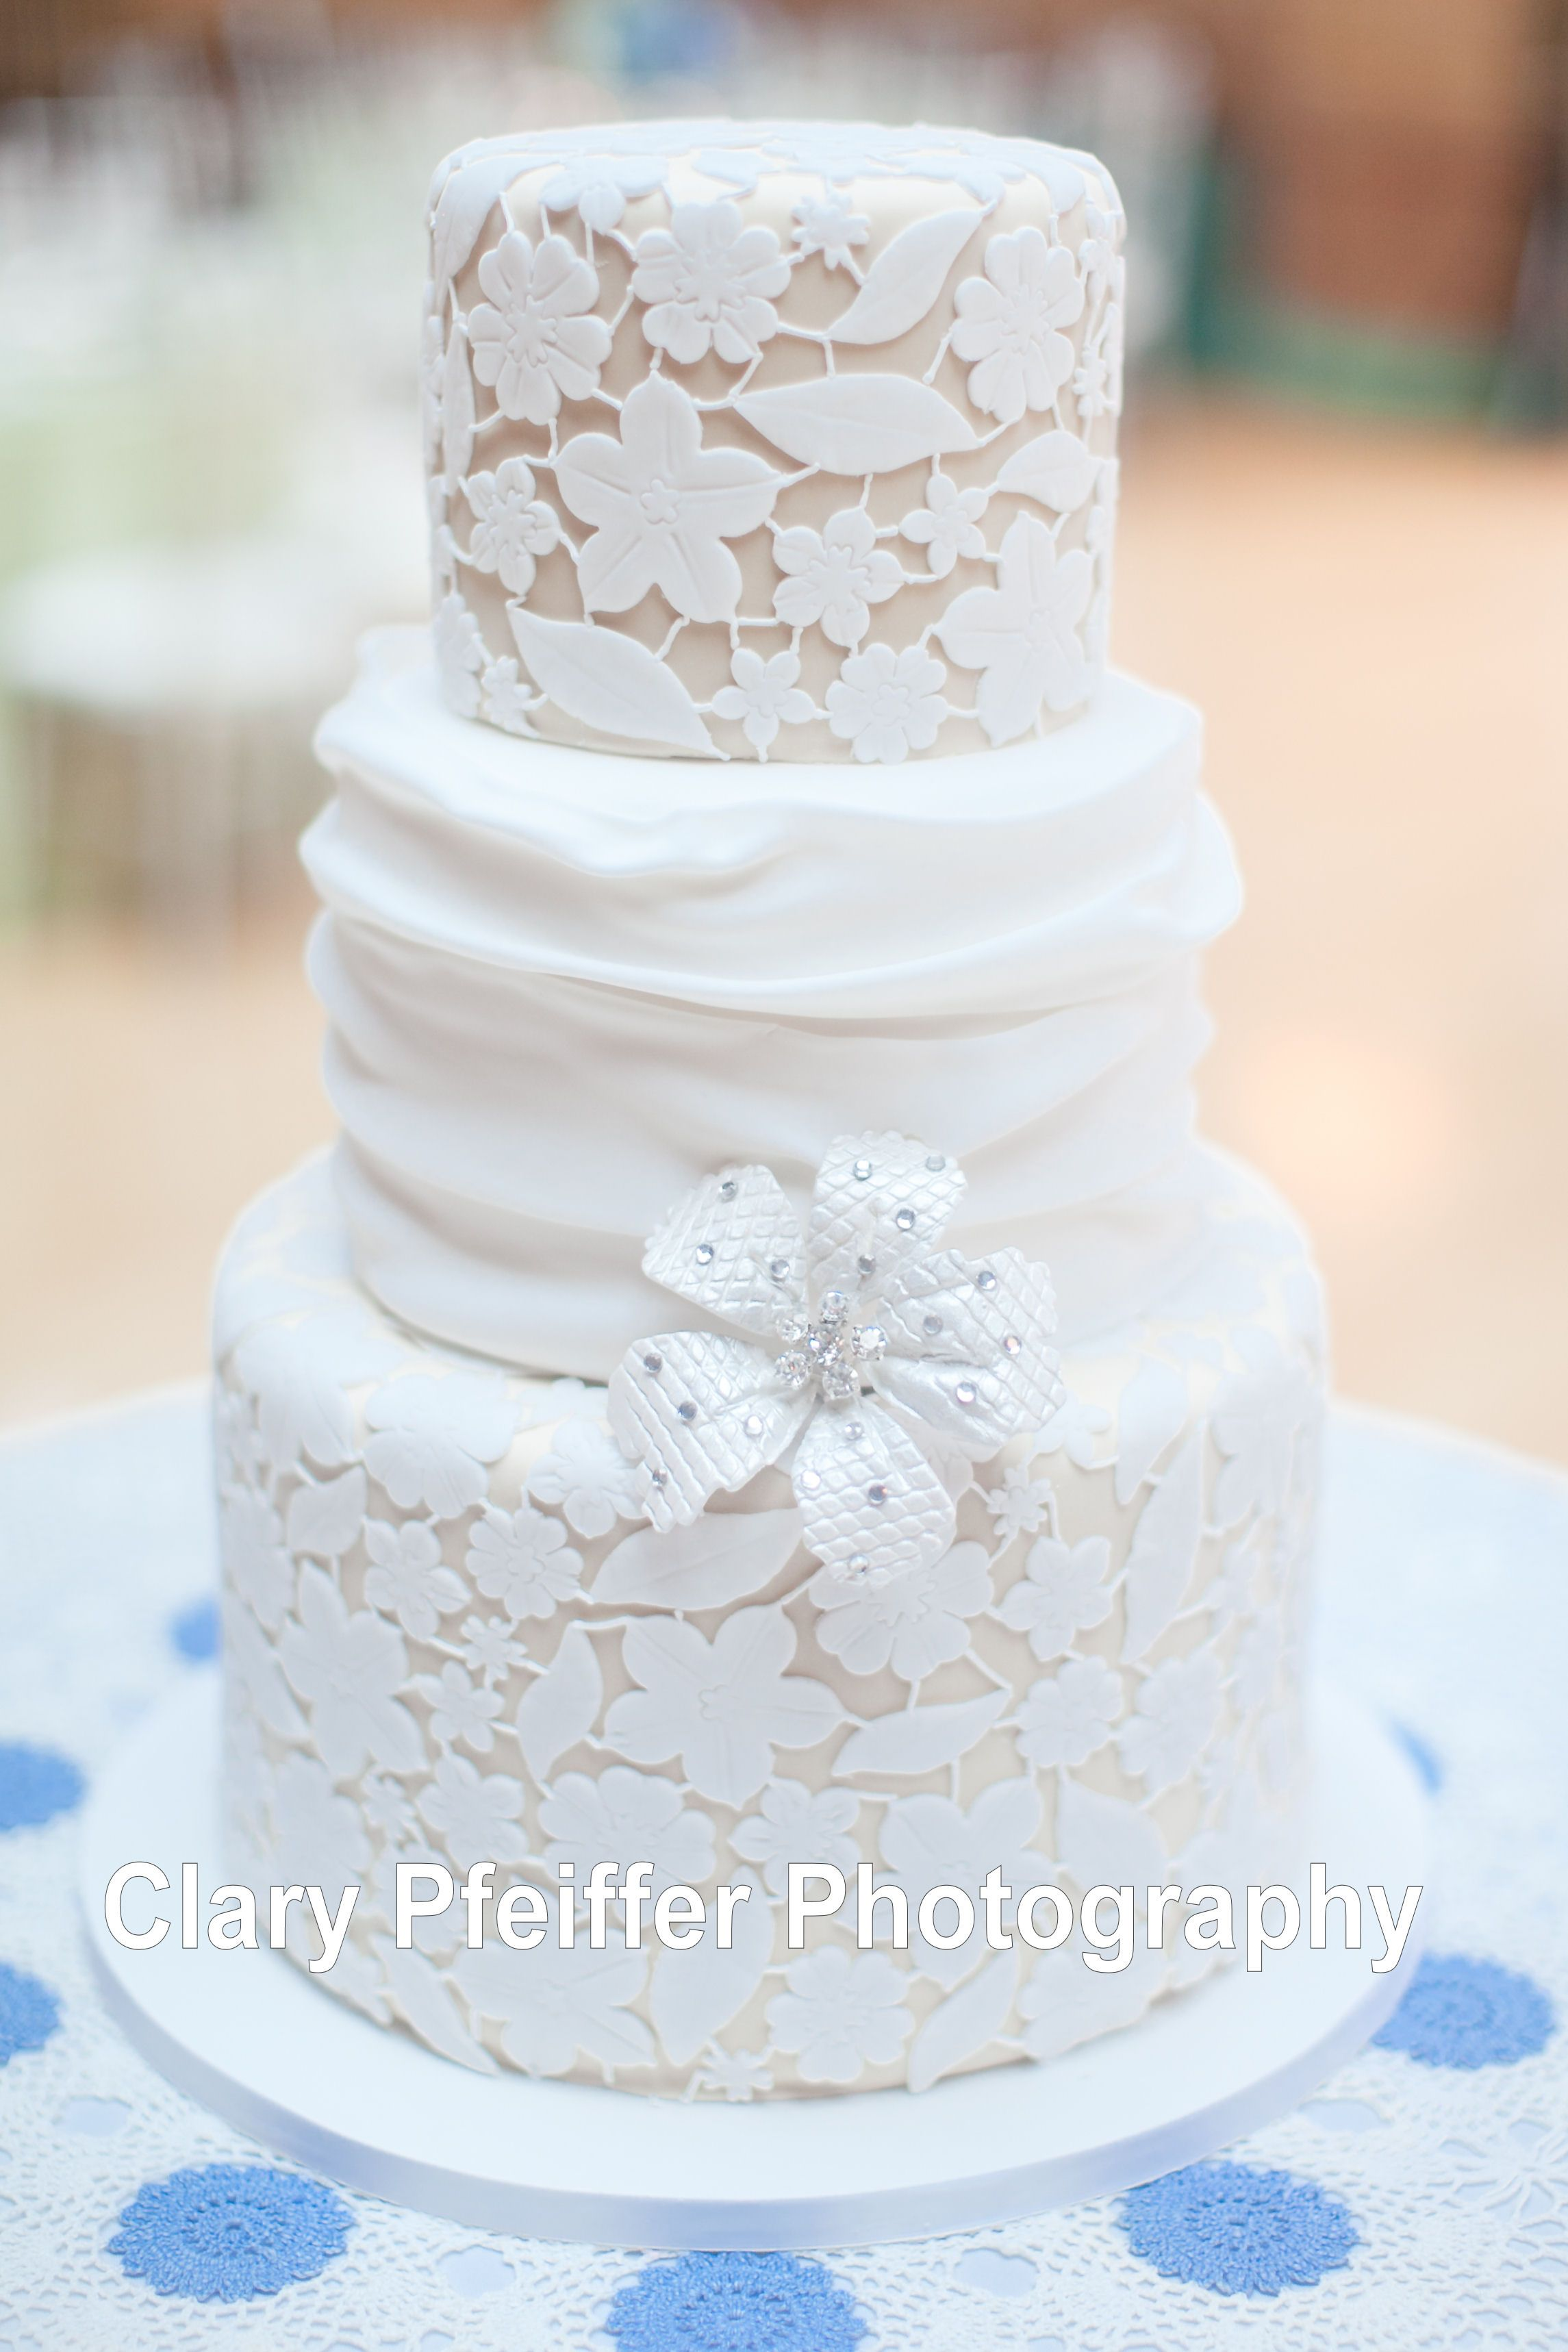 Amy Beck Cake Design Chicago Il 3 Tier Fondant Wedding Cake